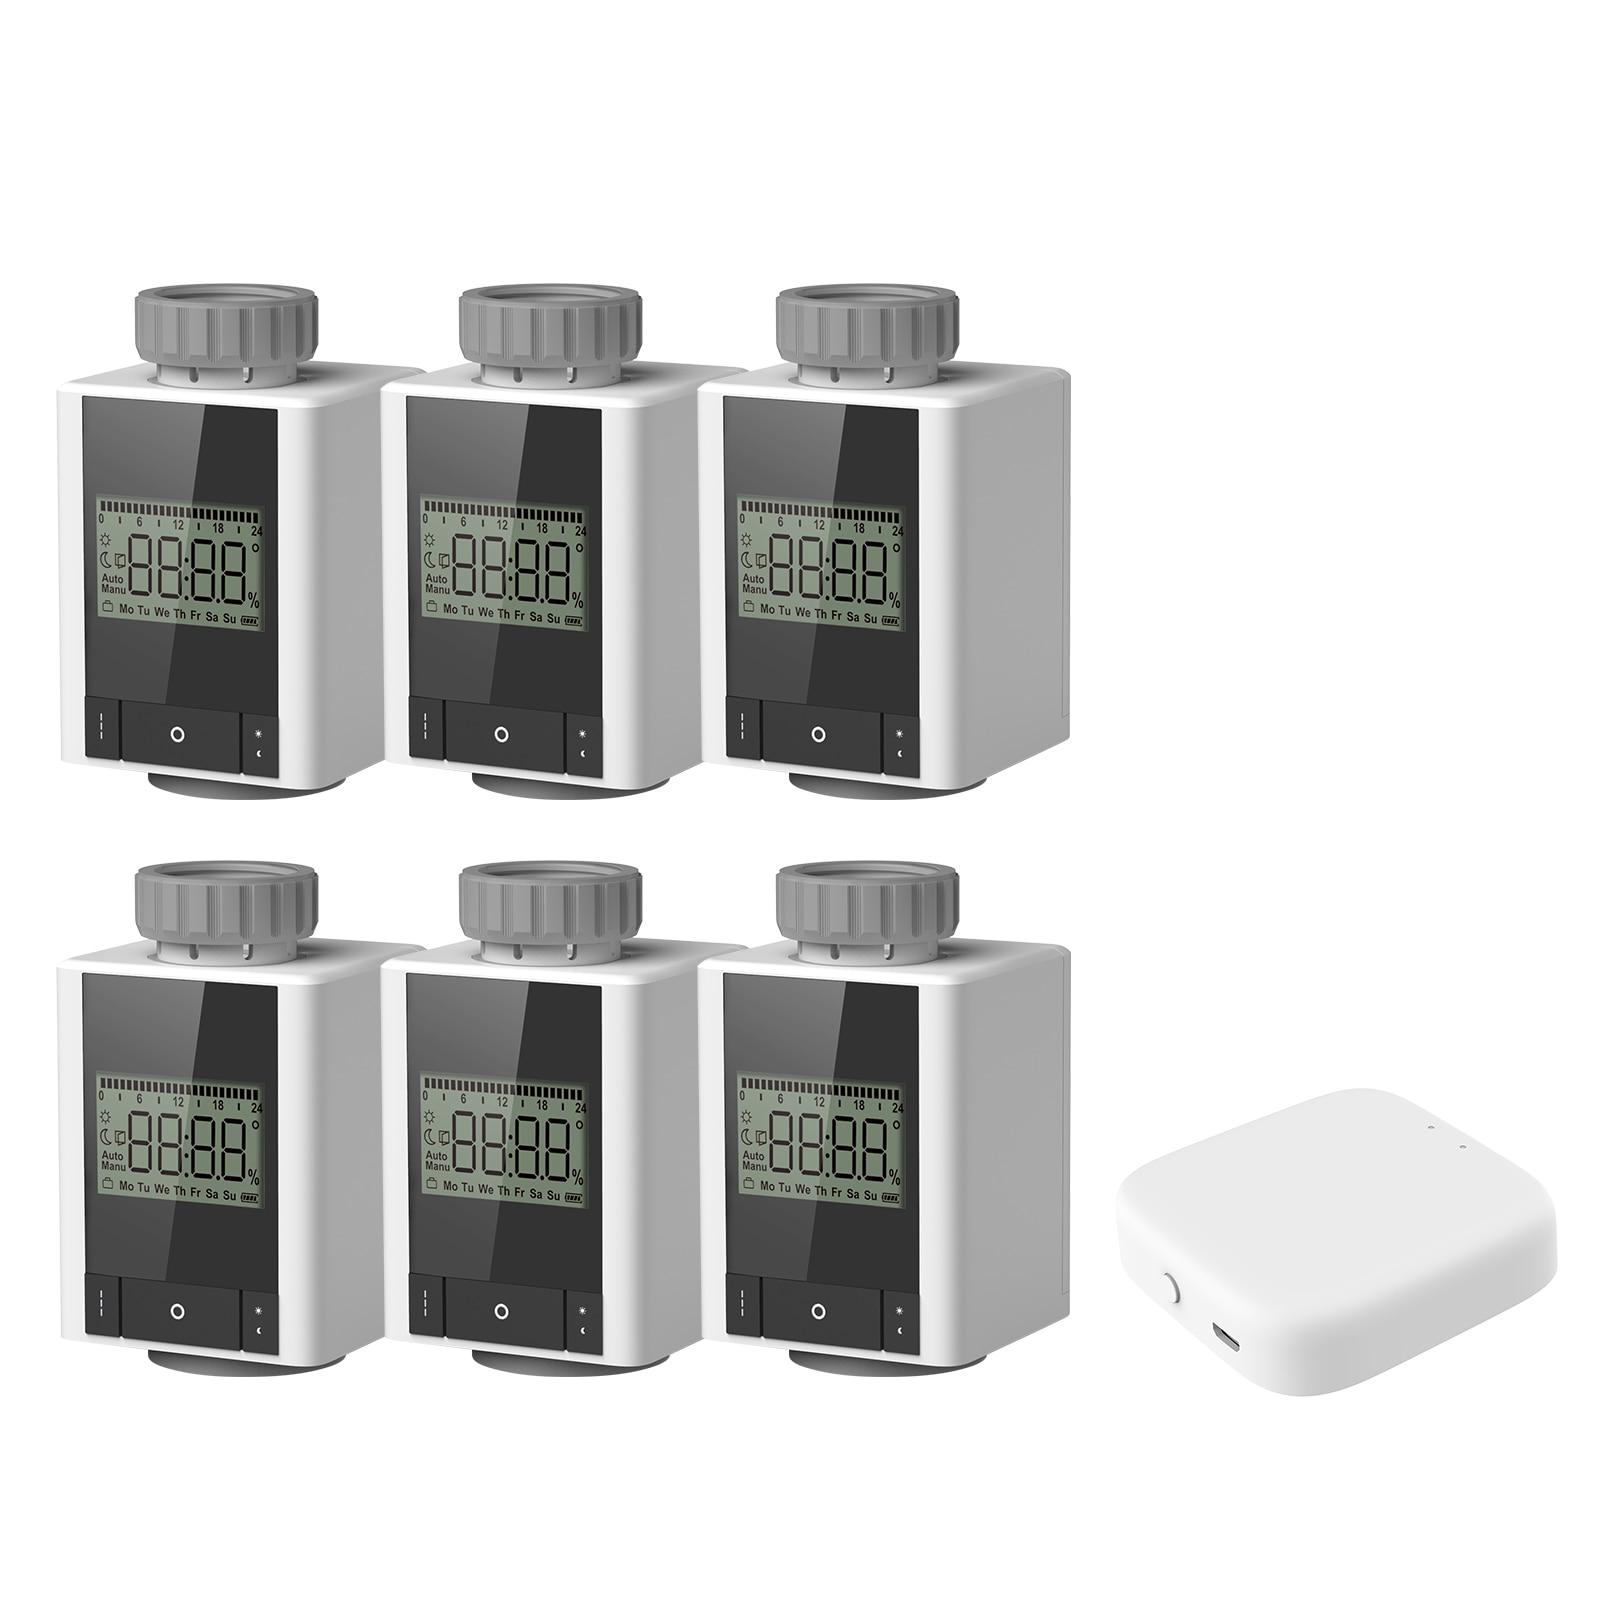 ZigBee-صمام مبرد ثرموستاتي ، مبرمج أسبوعي ، تدفئة ذكية ، ترموستات ، تحكم صوتي عن طريق تطبيق Tuya Gateway ، 6 قطعة